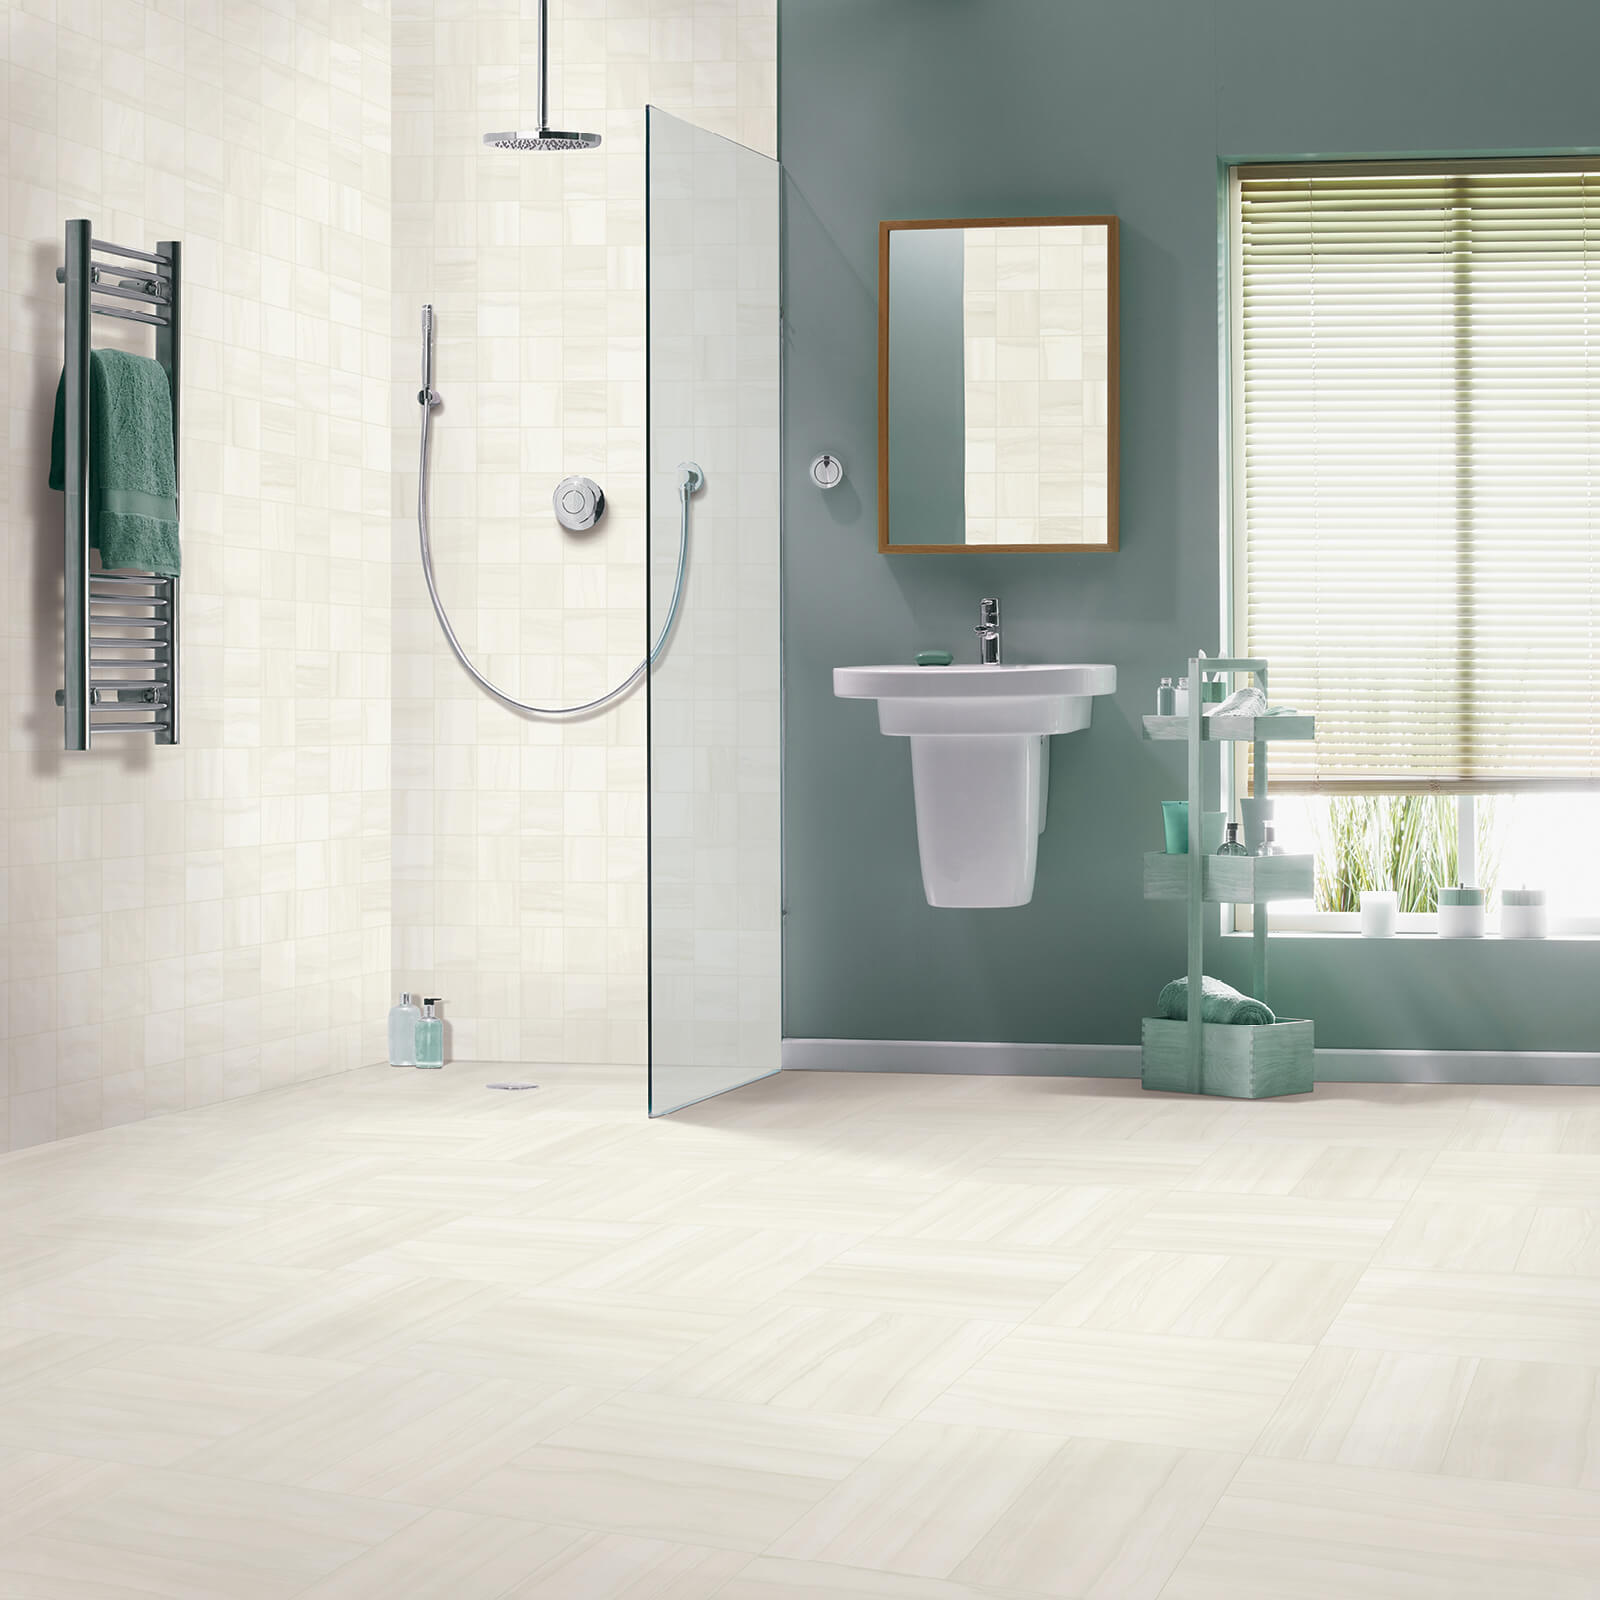 Window treatment | Dolphin Carpet & Tile